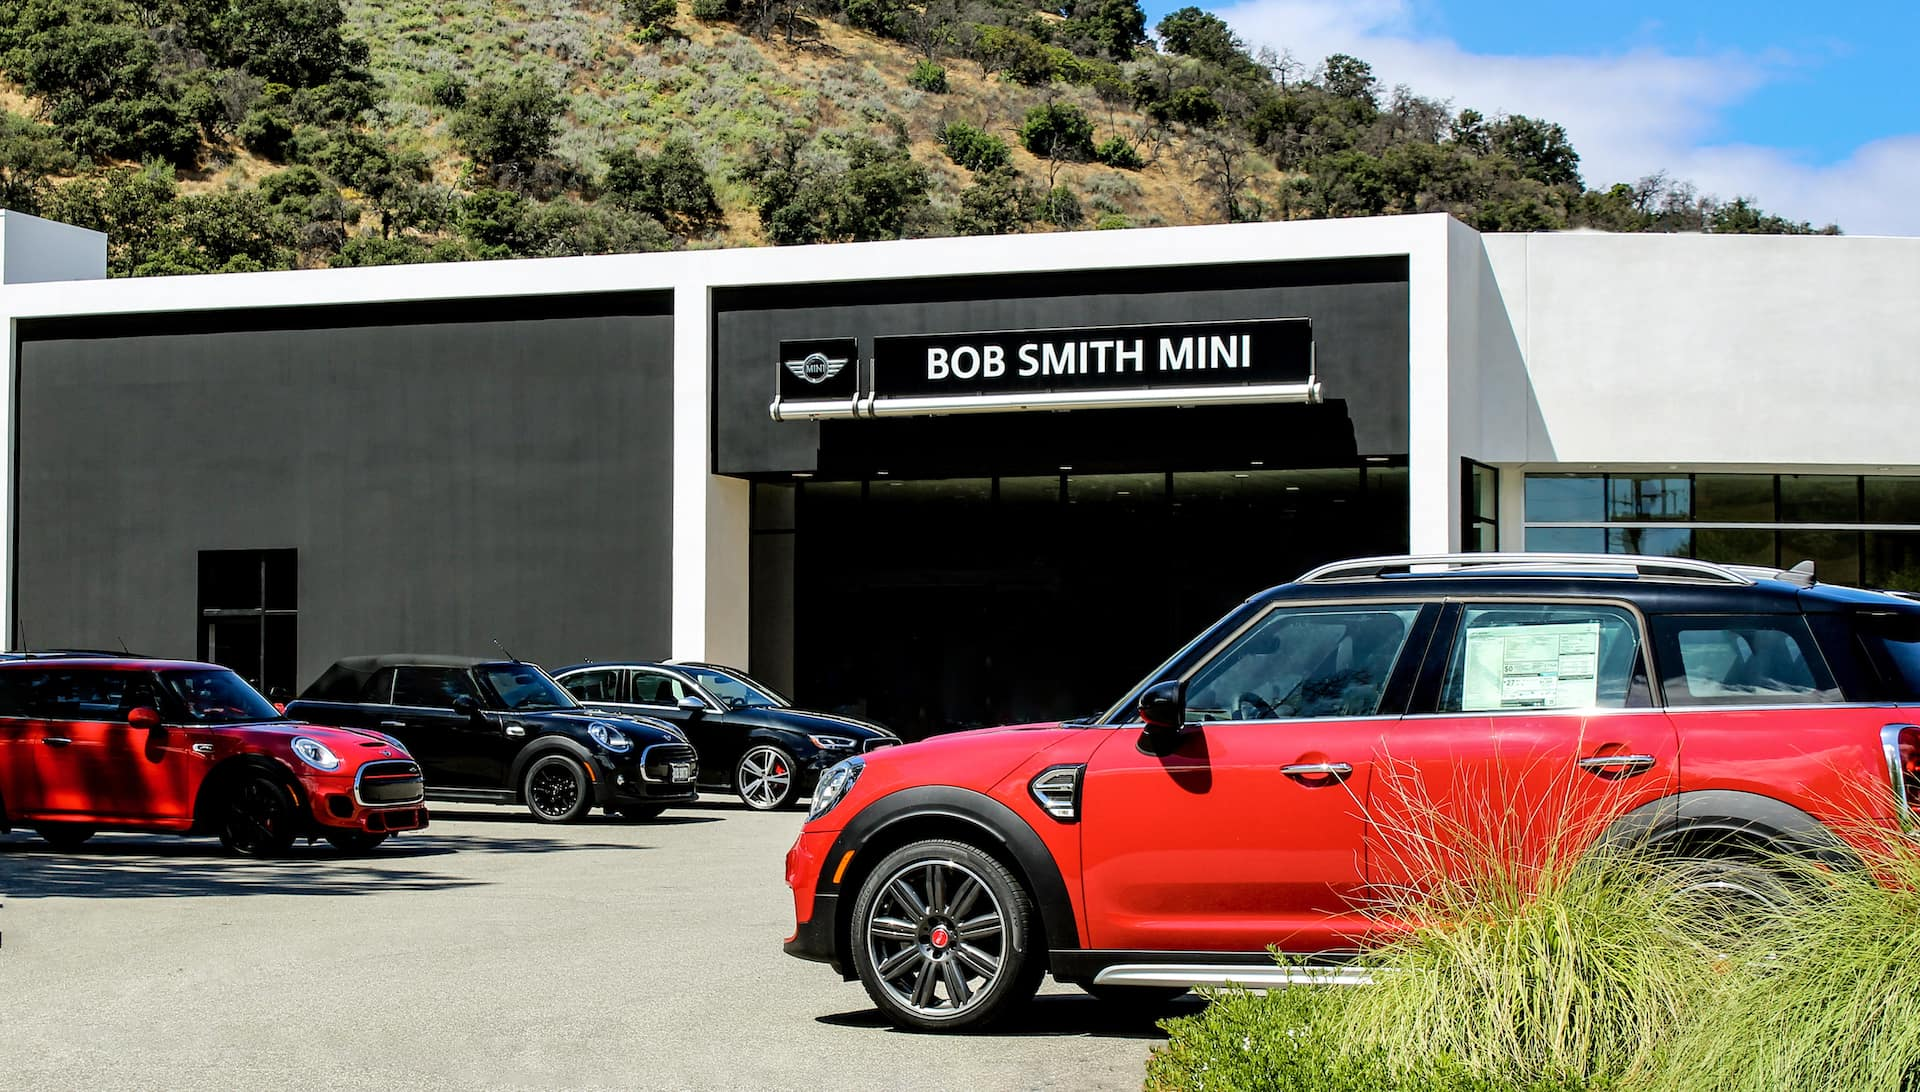 Bob Smith MINI Storefront